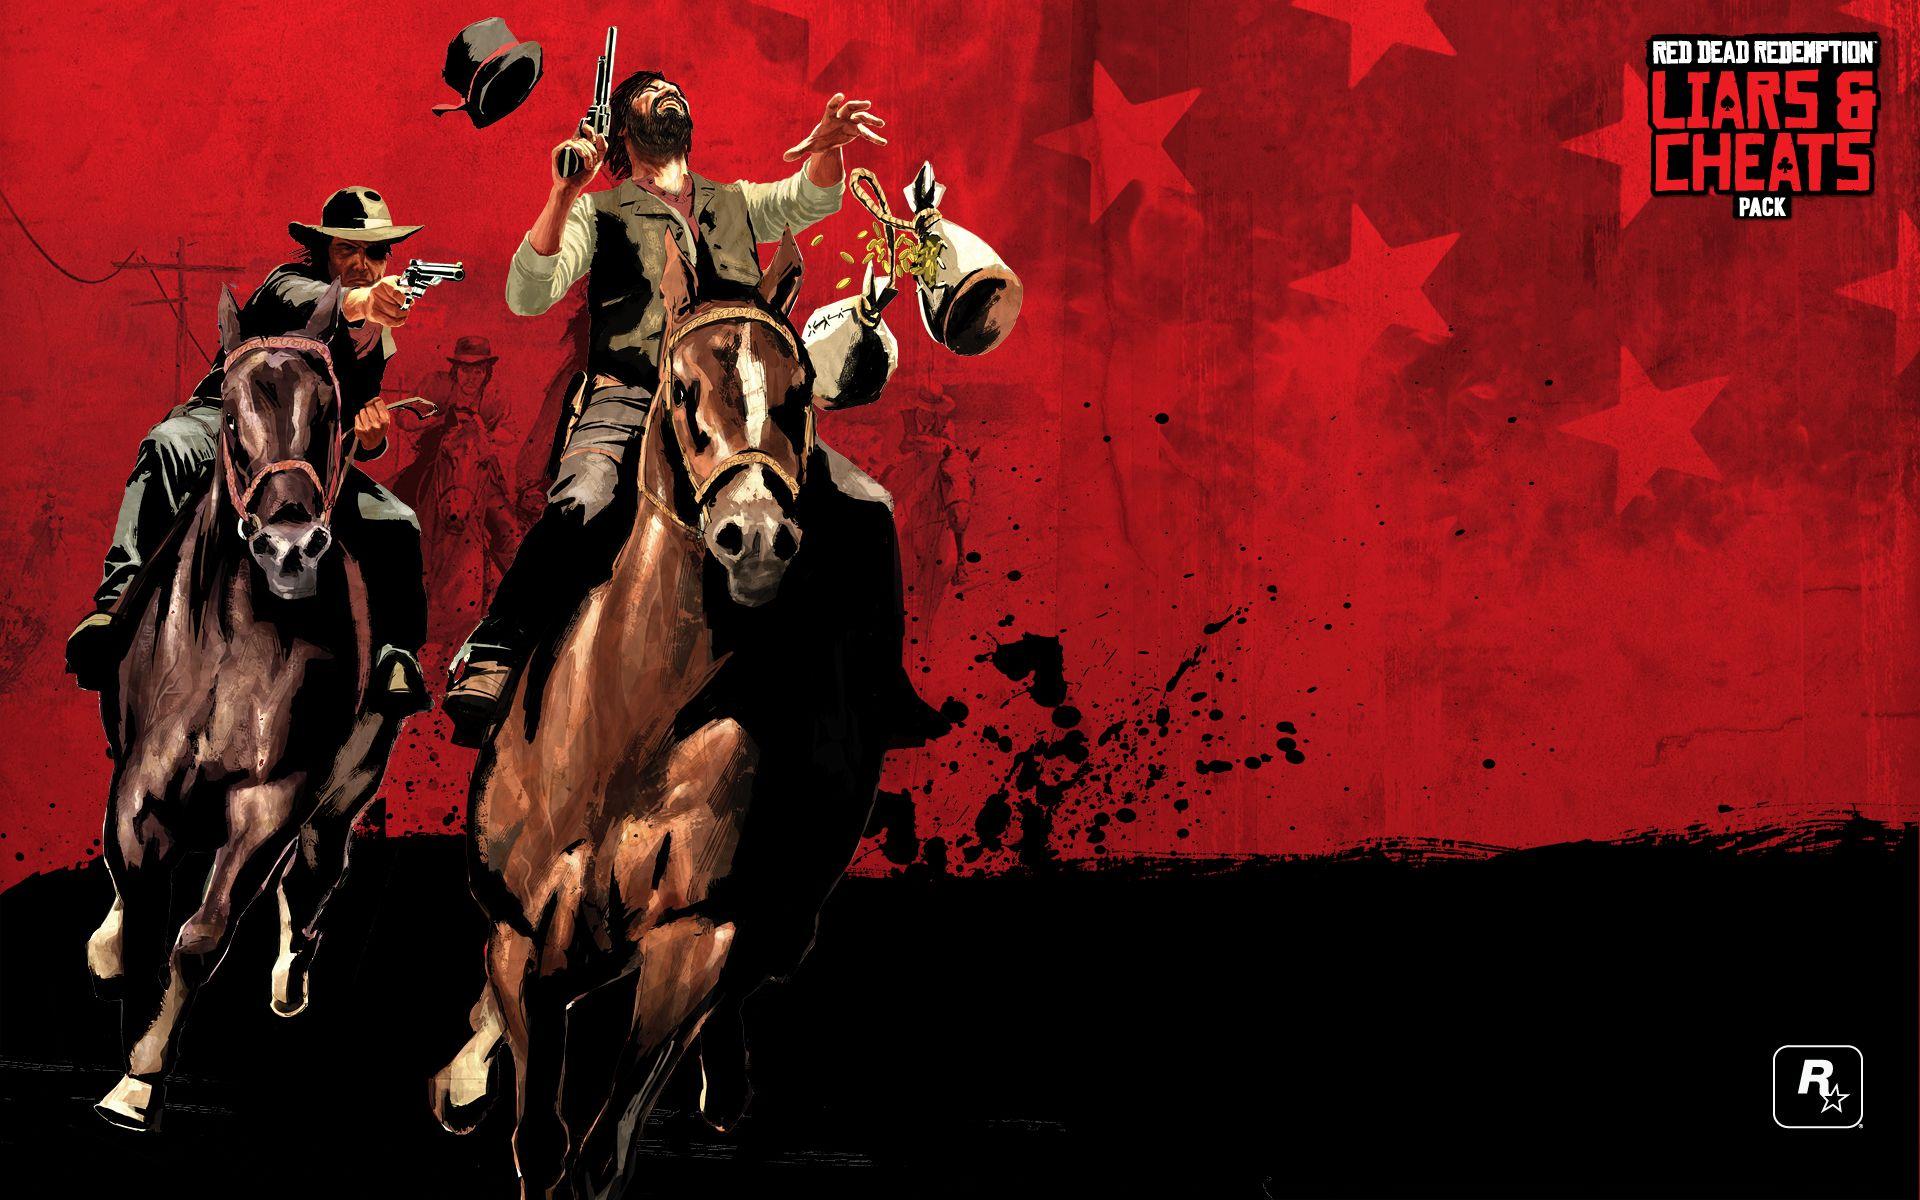 Red Dead Redemption By Rockstar Red Dead Redemption Game Red